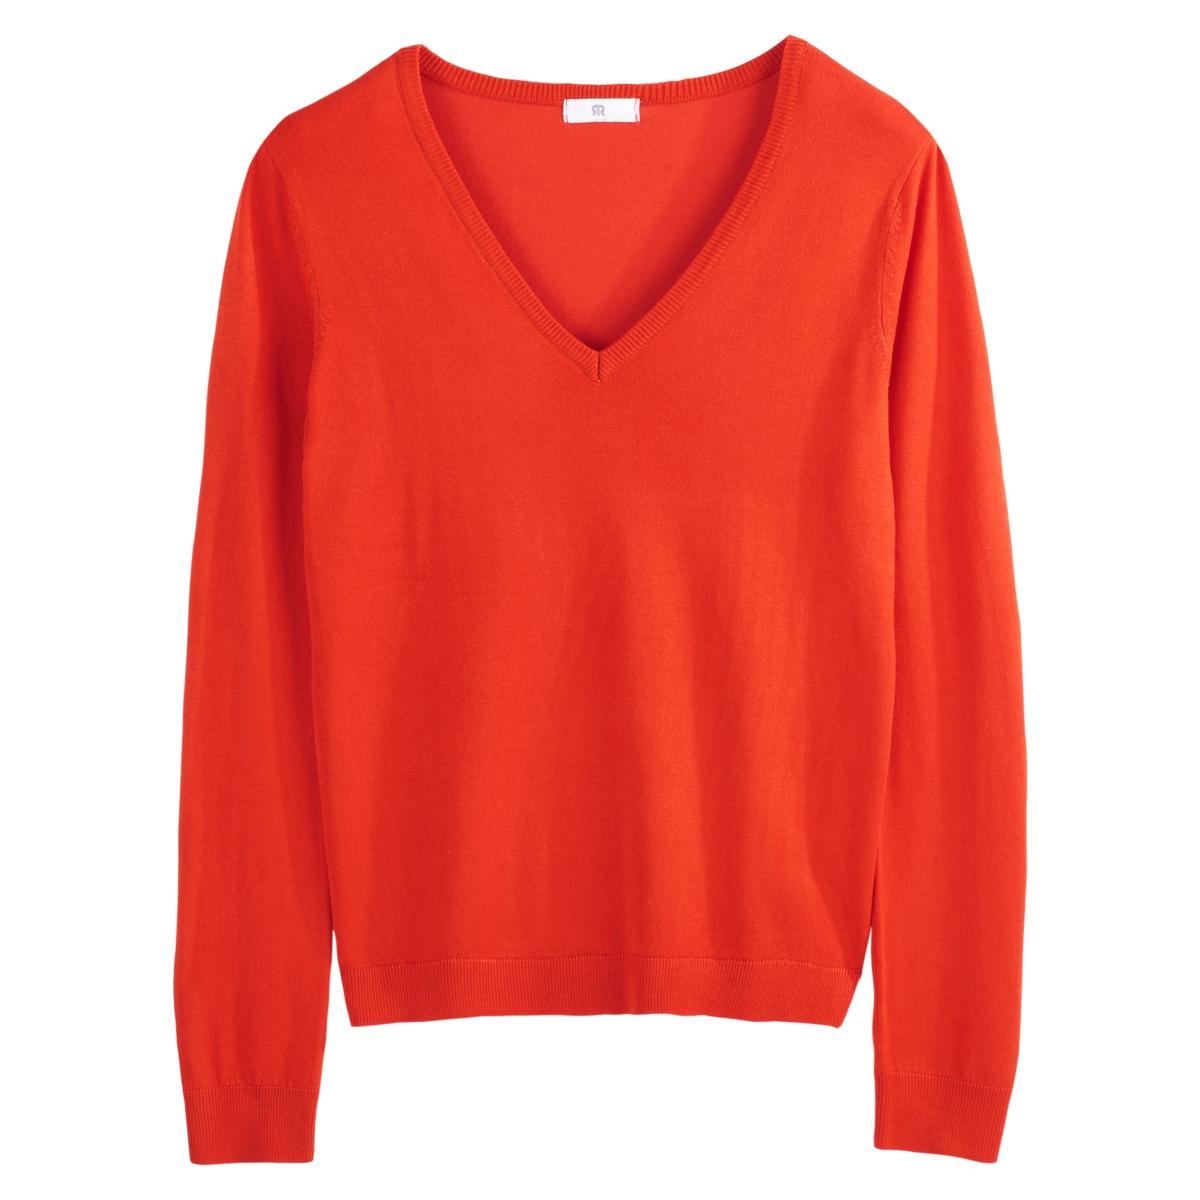 Jersey con cuello de pico, manga larga y punto vaporoso